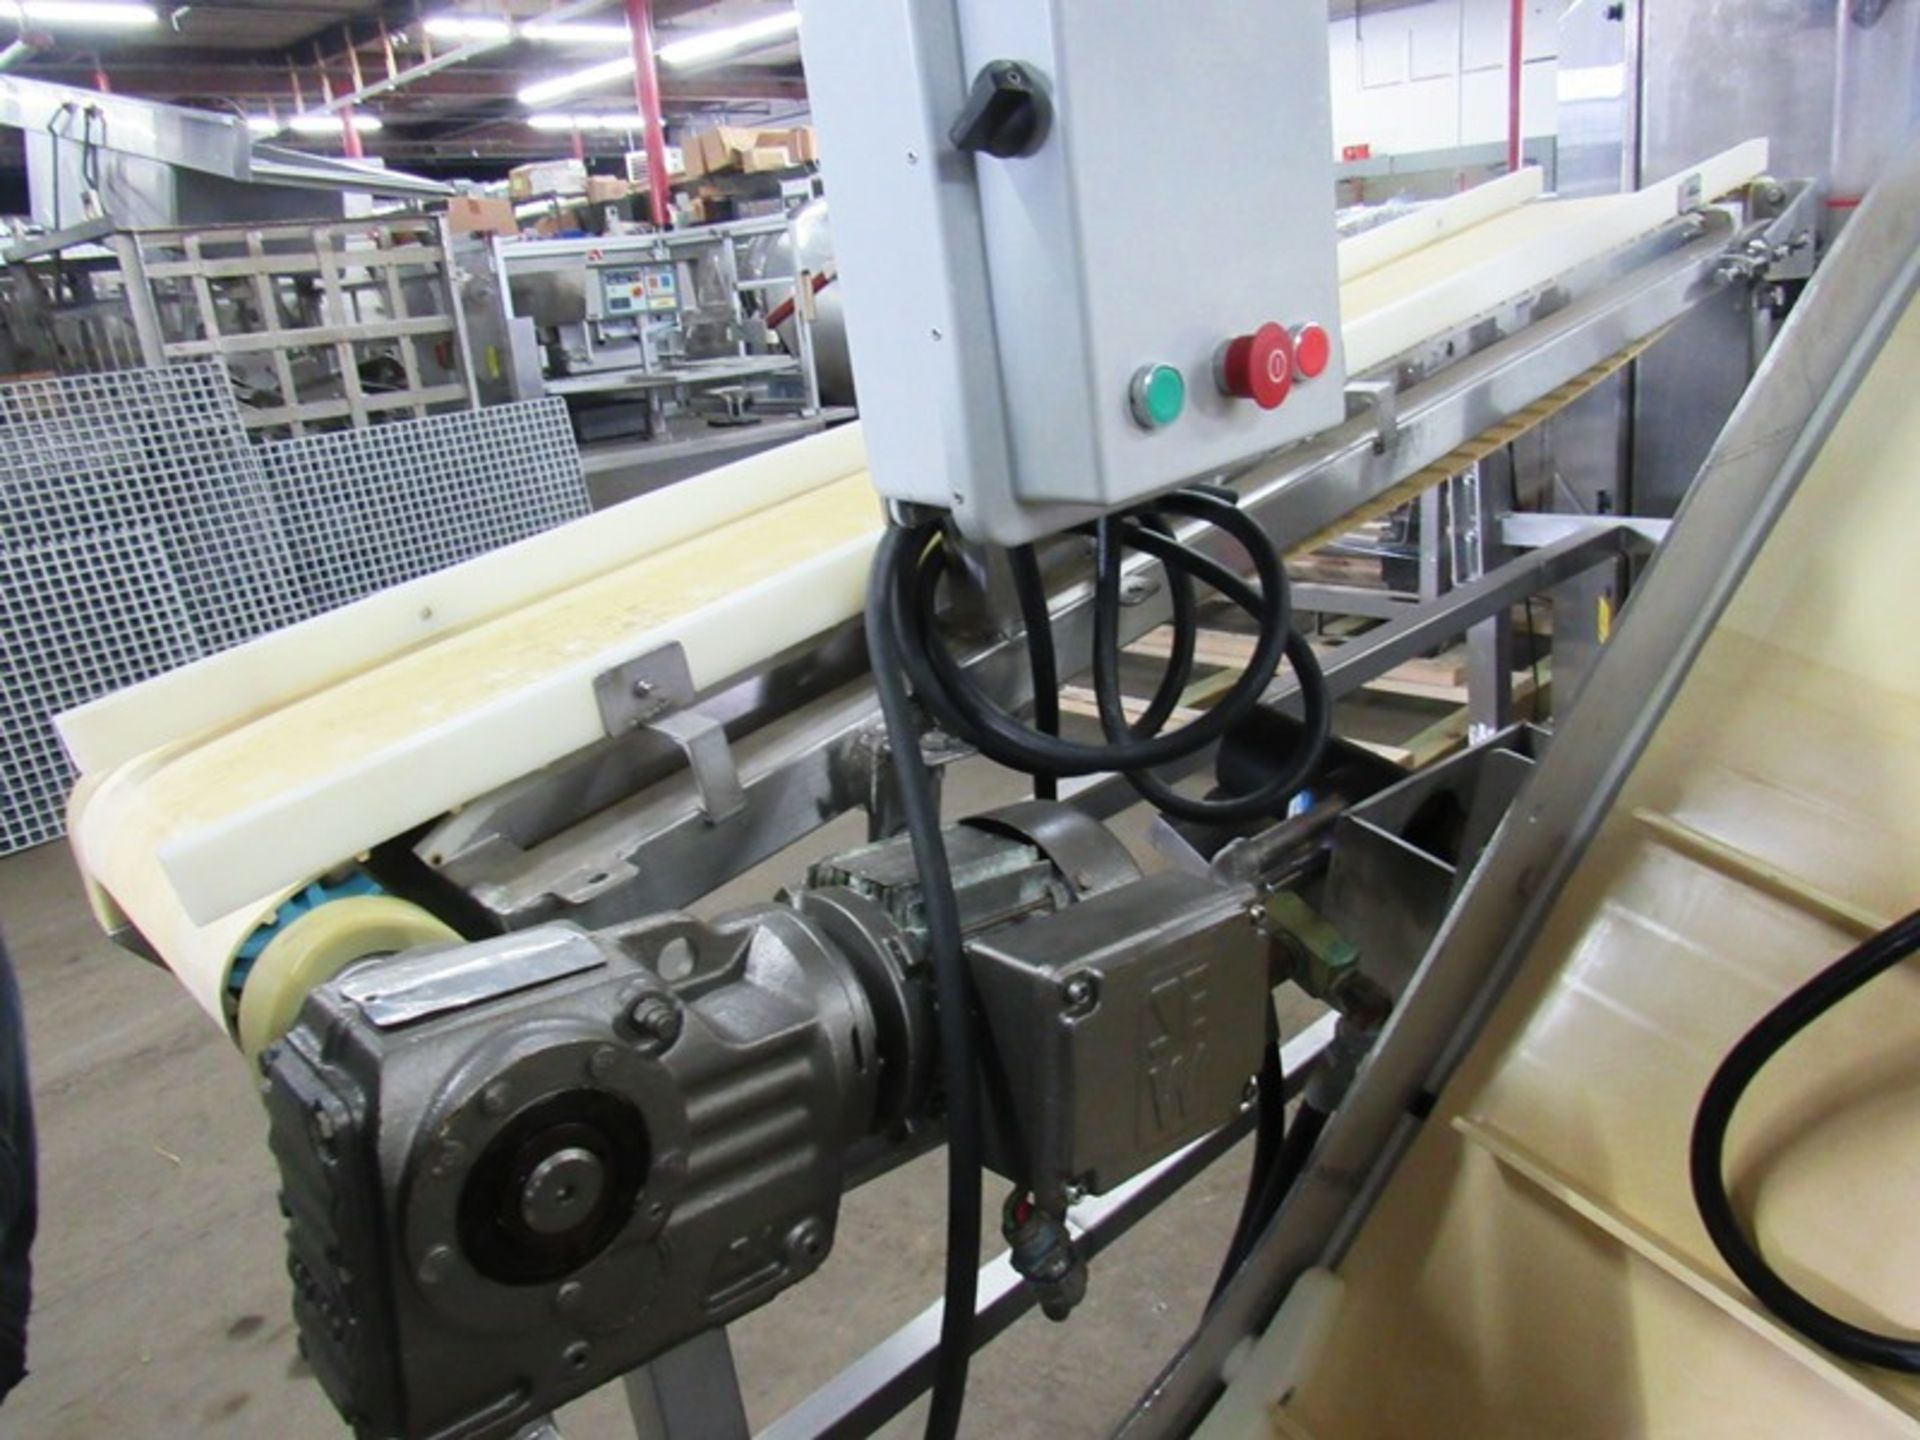 "Lot 42 - Stainless Steel Conveyor, 12"" W X 6' L neoprene belt, adjustable incline to flat, 230/460 volt"